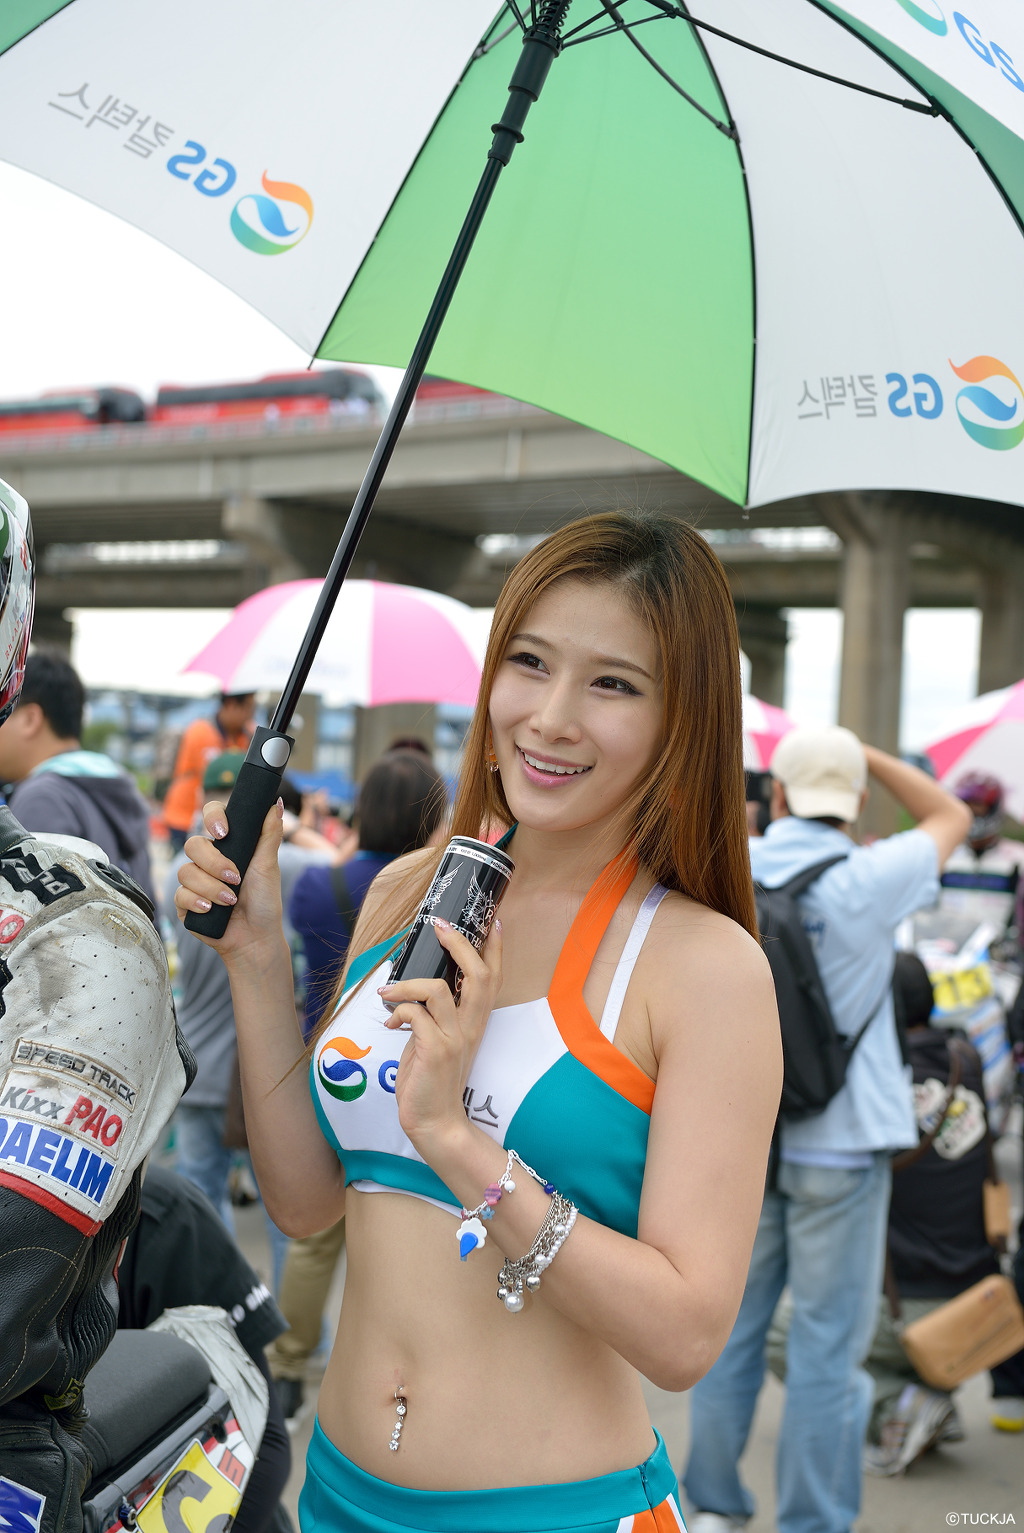 xxx nude girls: Hwang Ga Hi at KSRC R3 2012